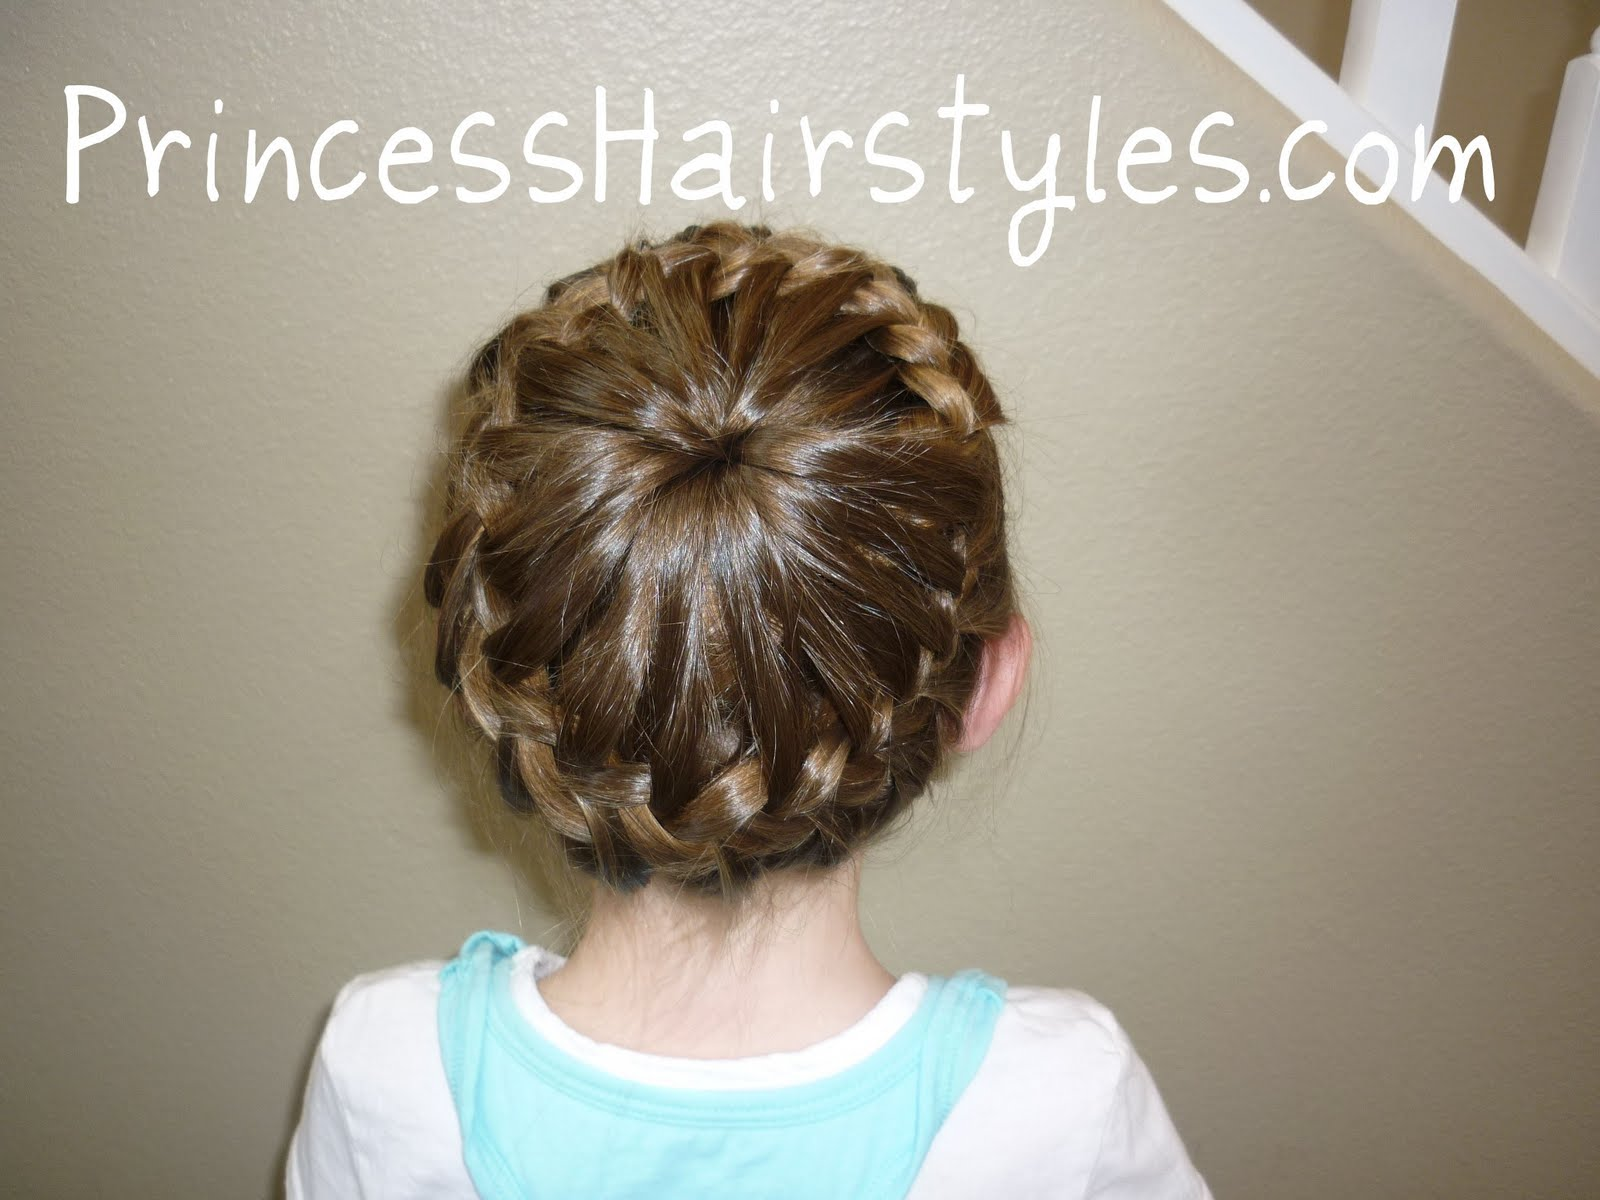 Miraculous Never Ending French Braid Bun Hairstyles For Girls Princess Short Hairstyles Gunalazisus